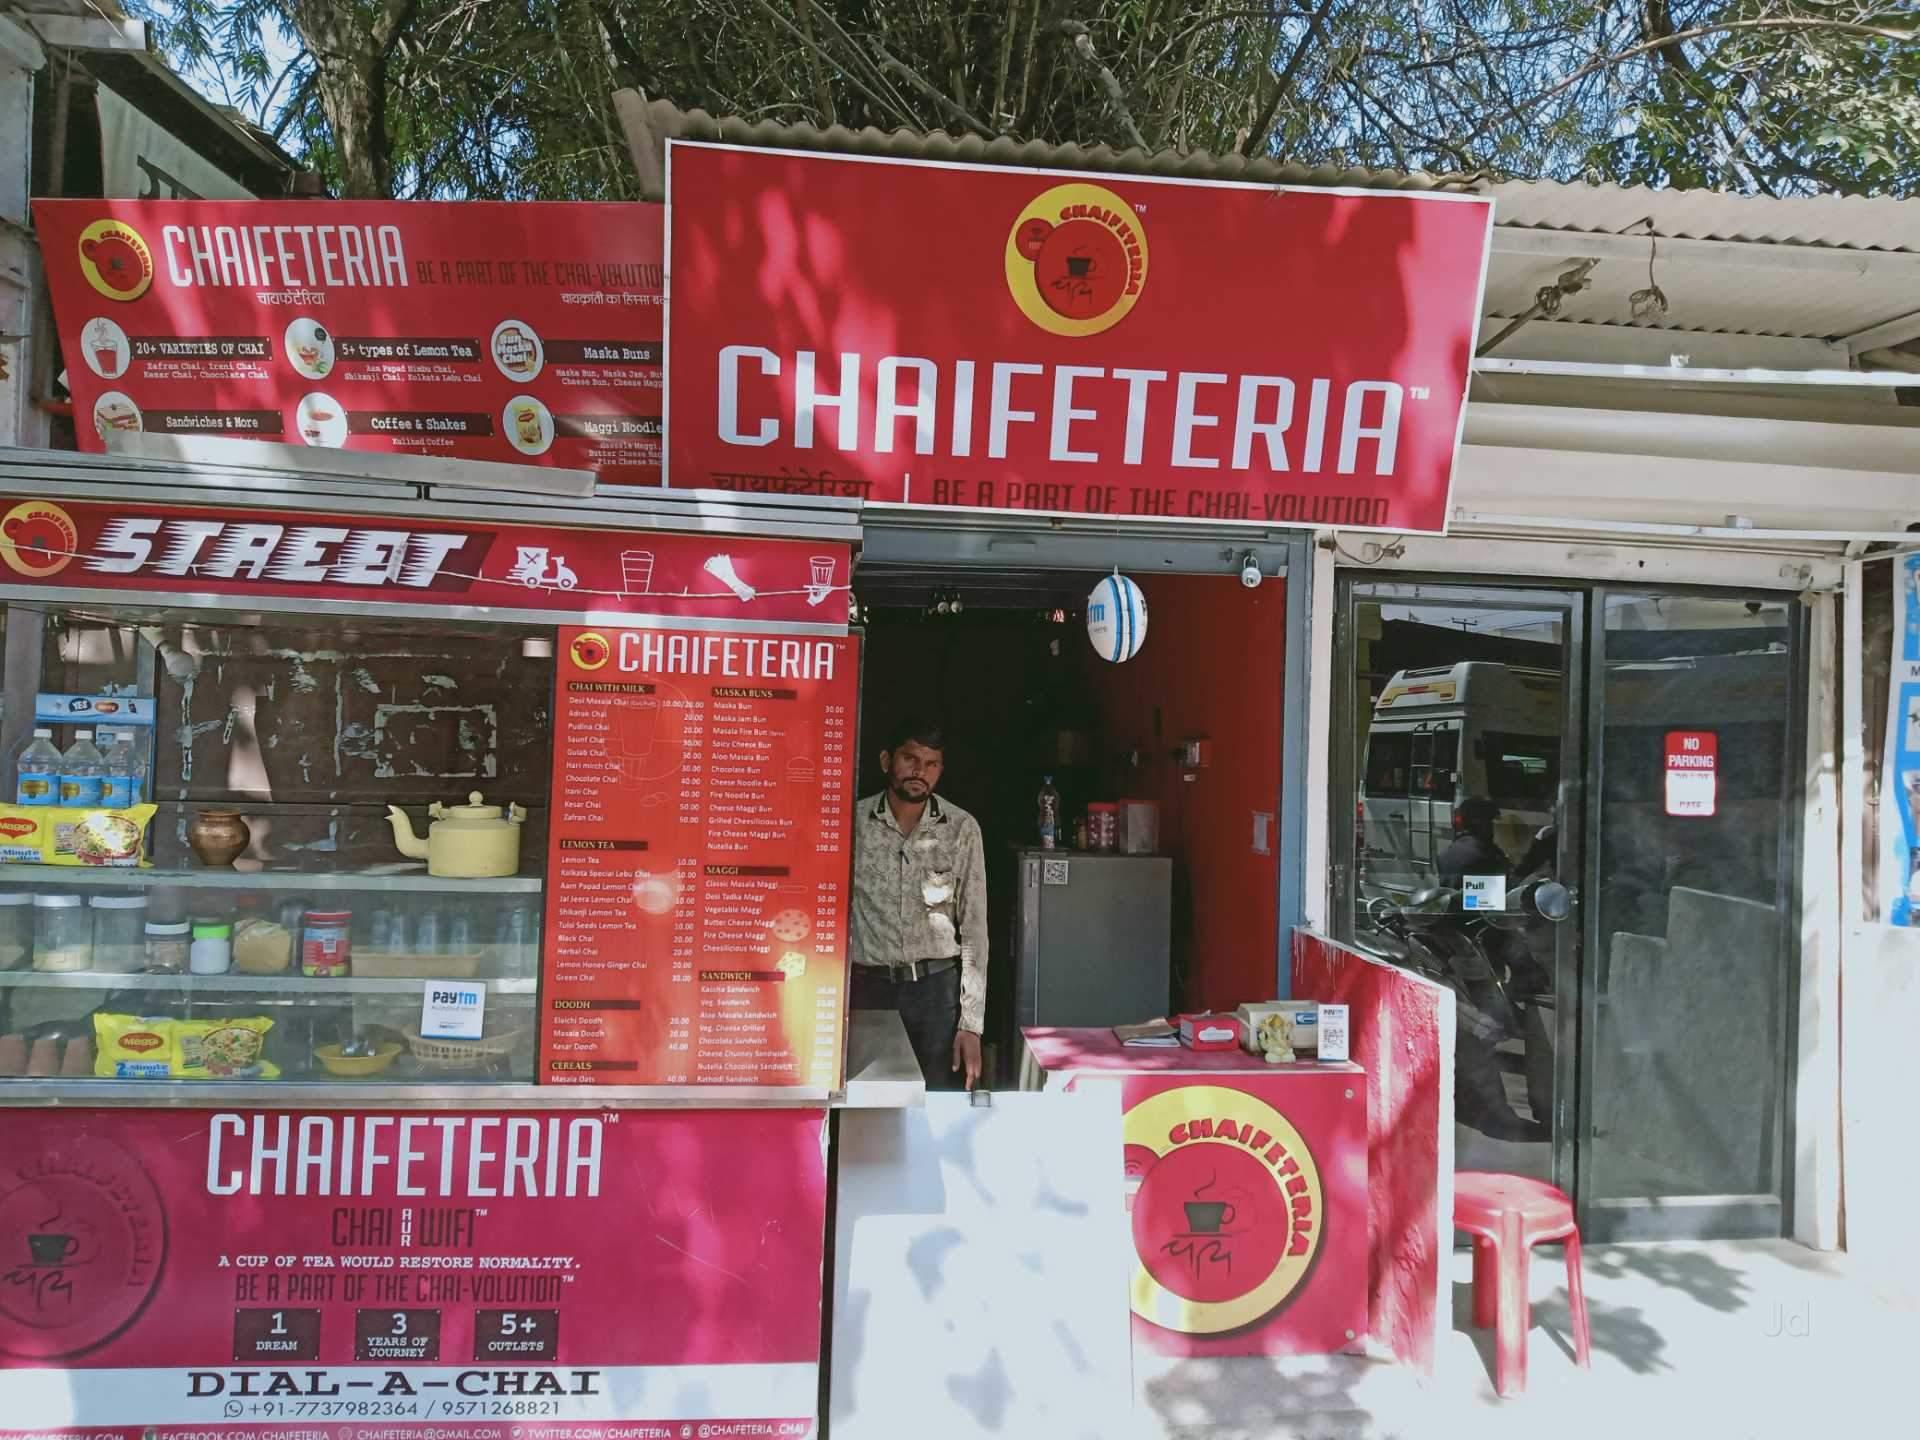 Chaifeteria Udaipur